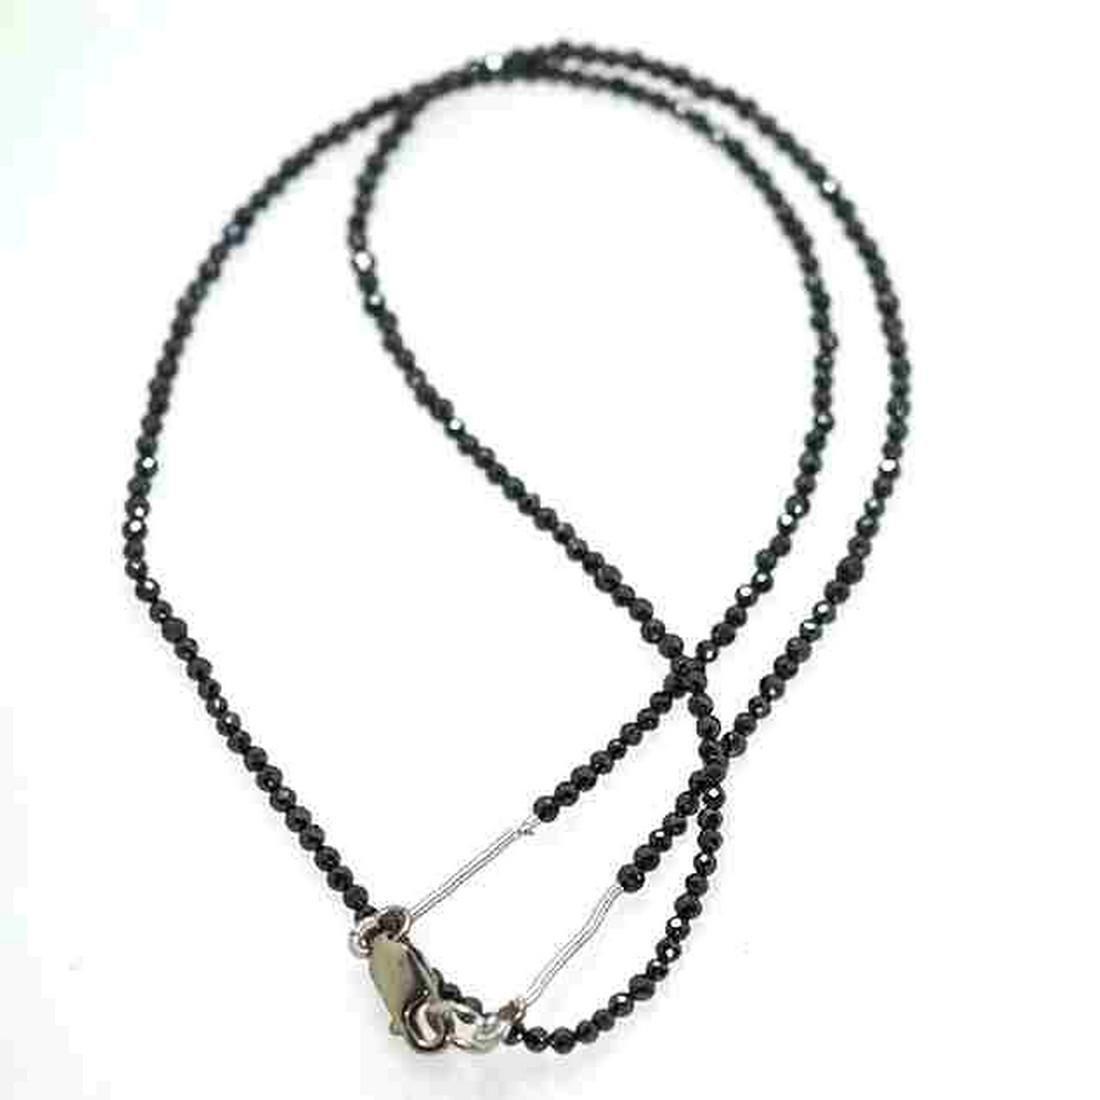 15.88 Cts Black Diamond Beads-1.52 mm,8.5 inch